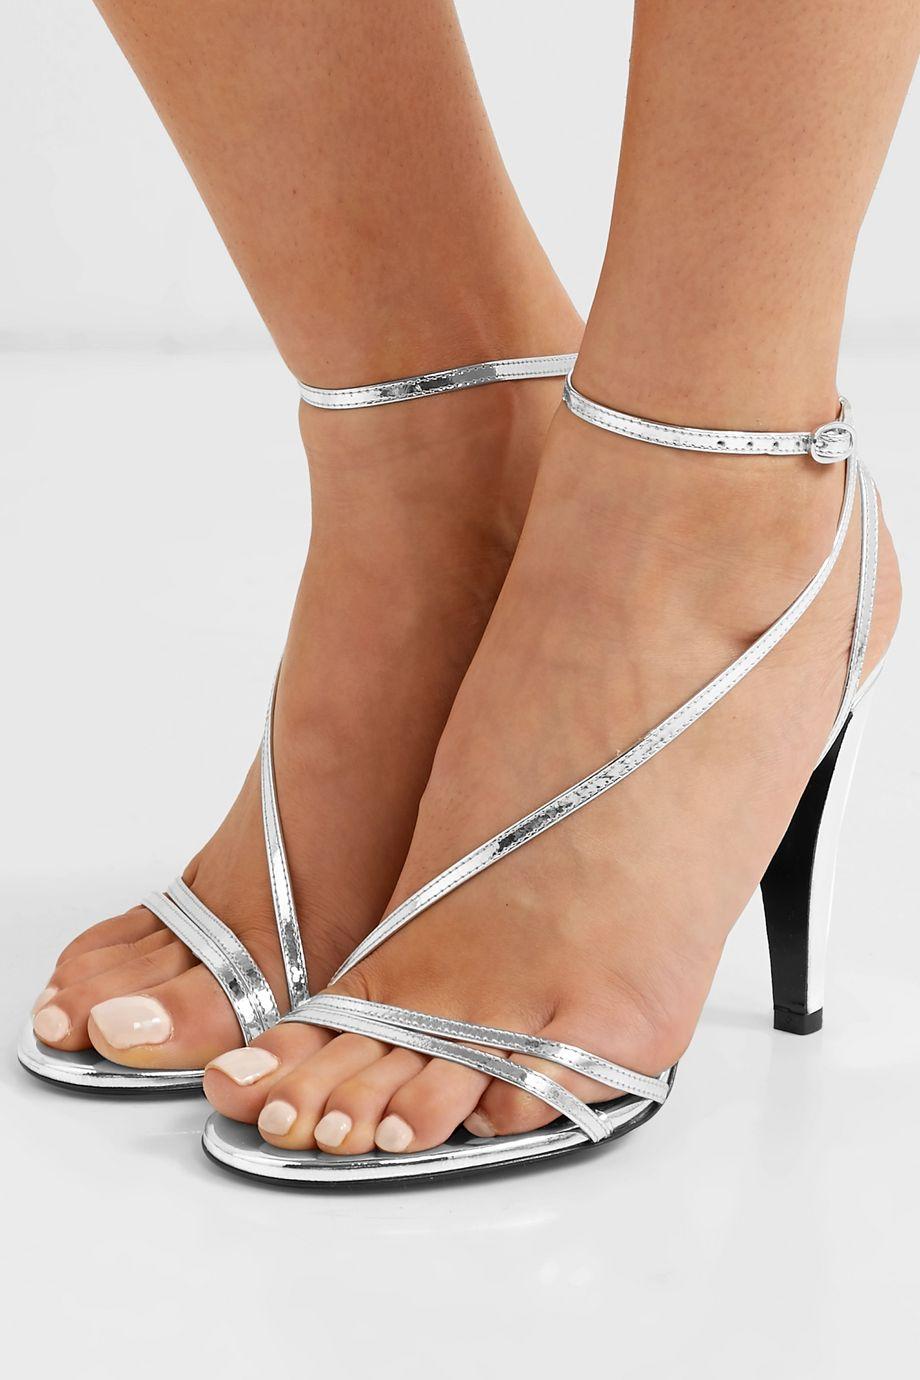 Isabel Marant Alta metallic leather sandals